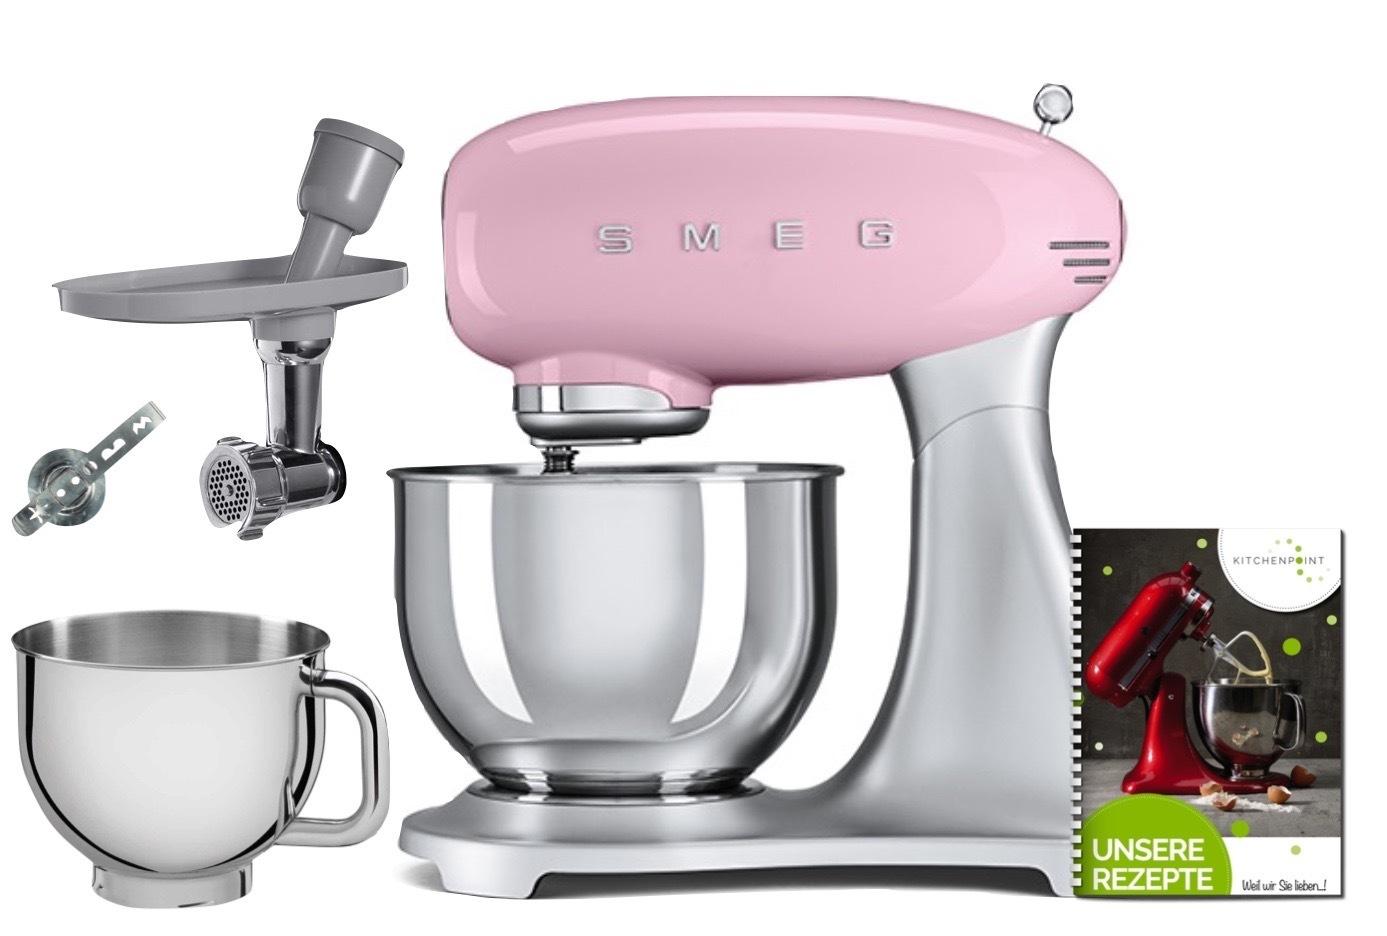 SMEG Küchenmaschine SMF02 - Back Mega Set Cadillac Pink